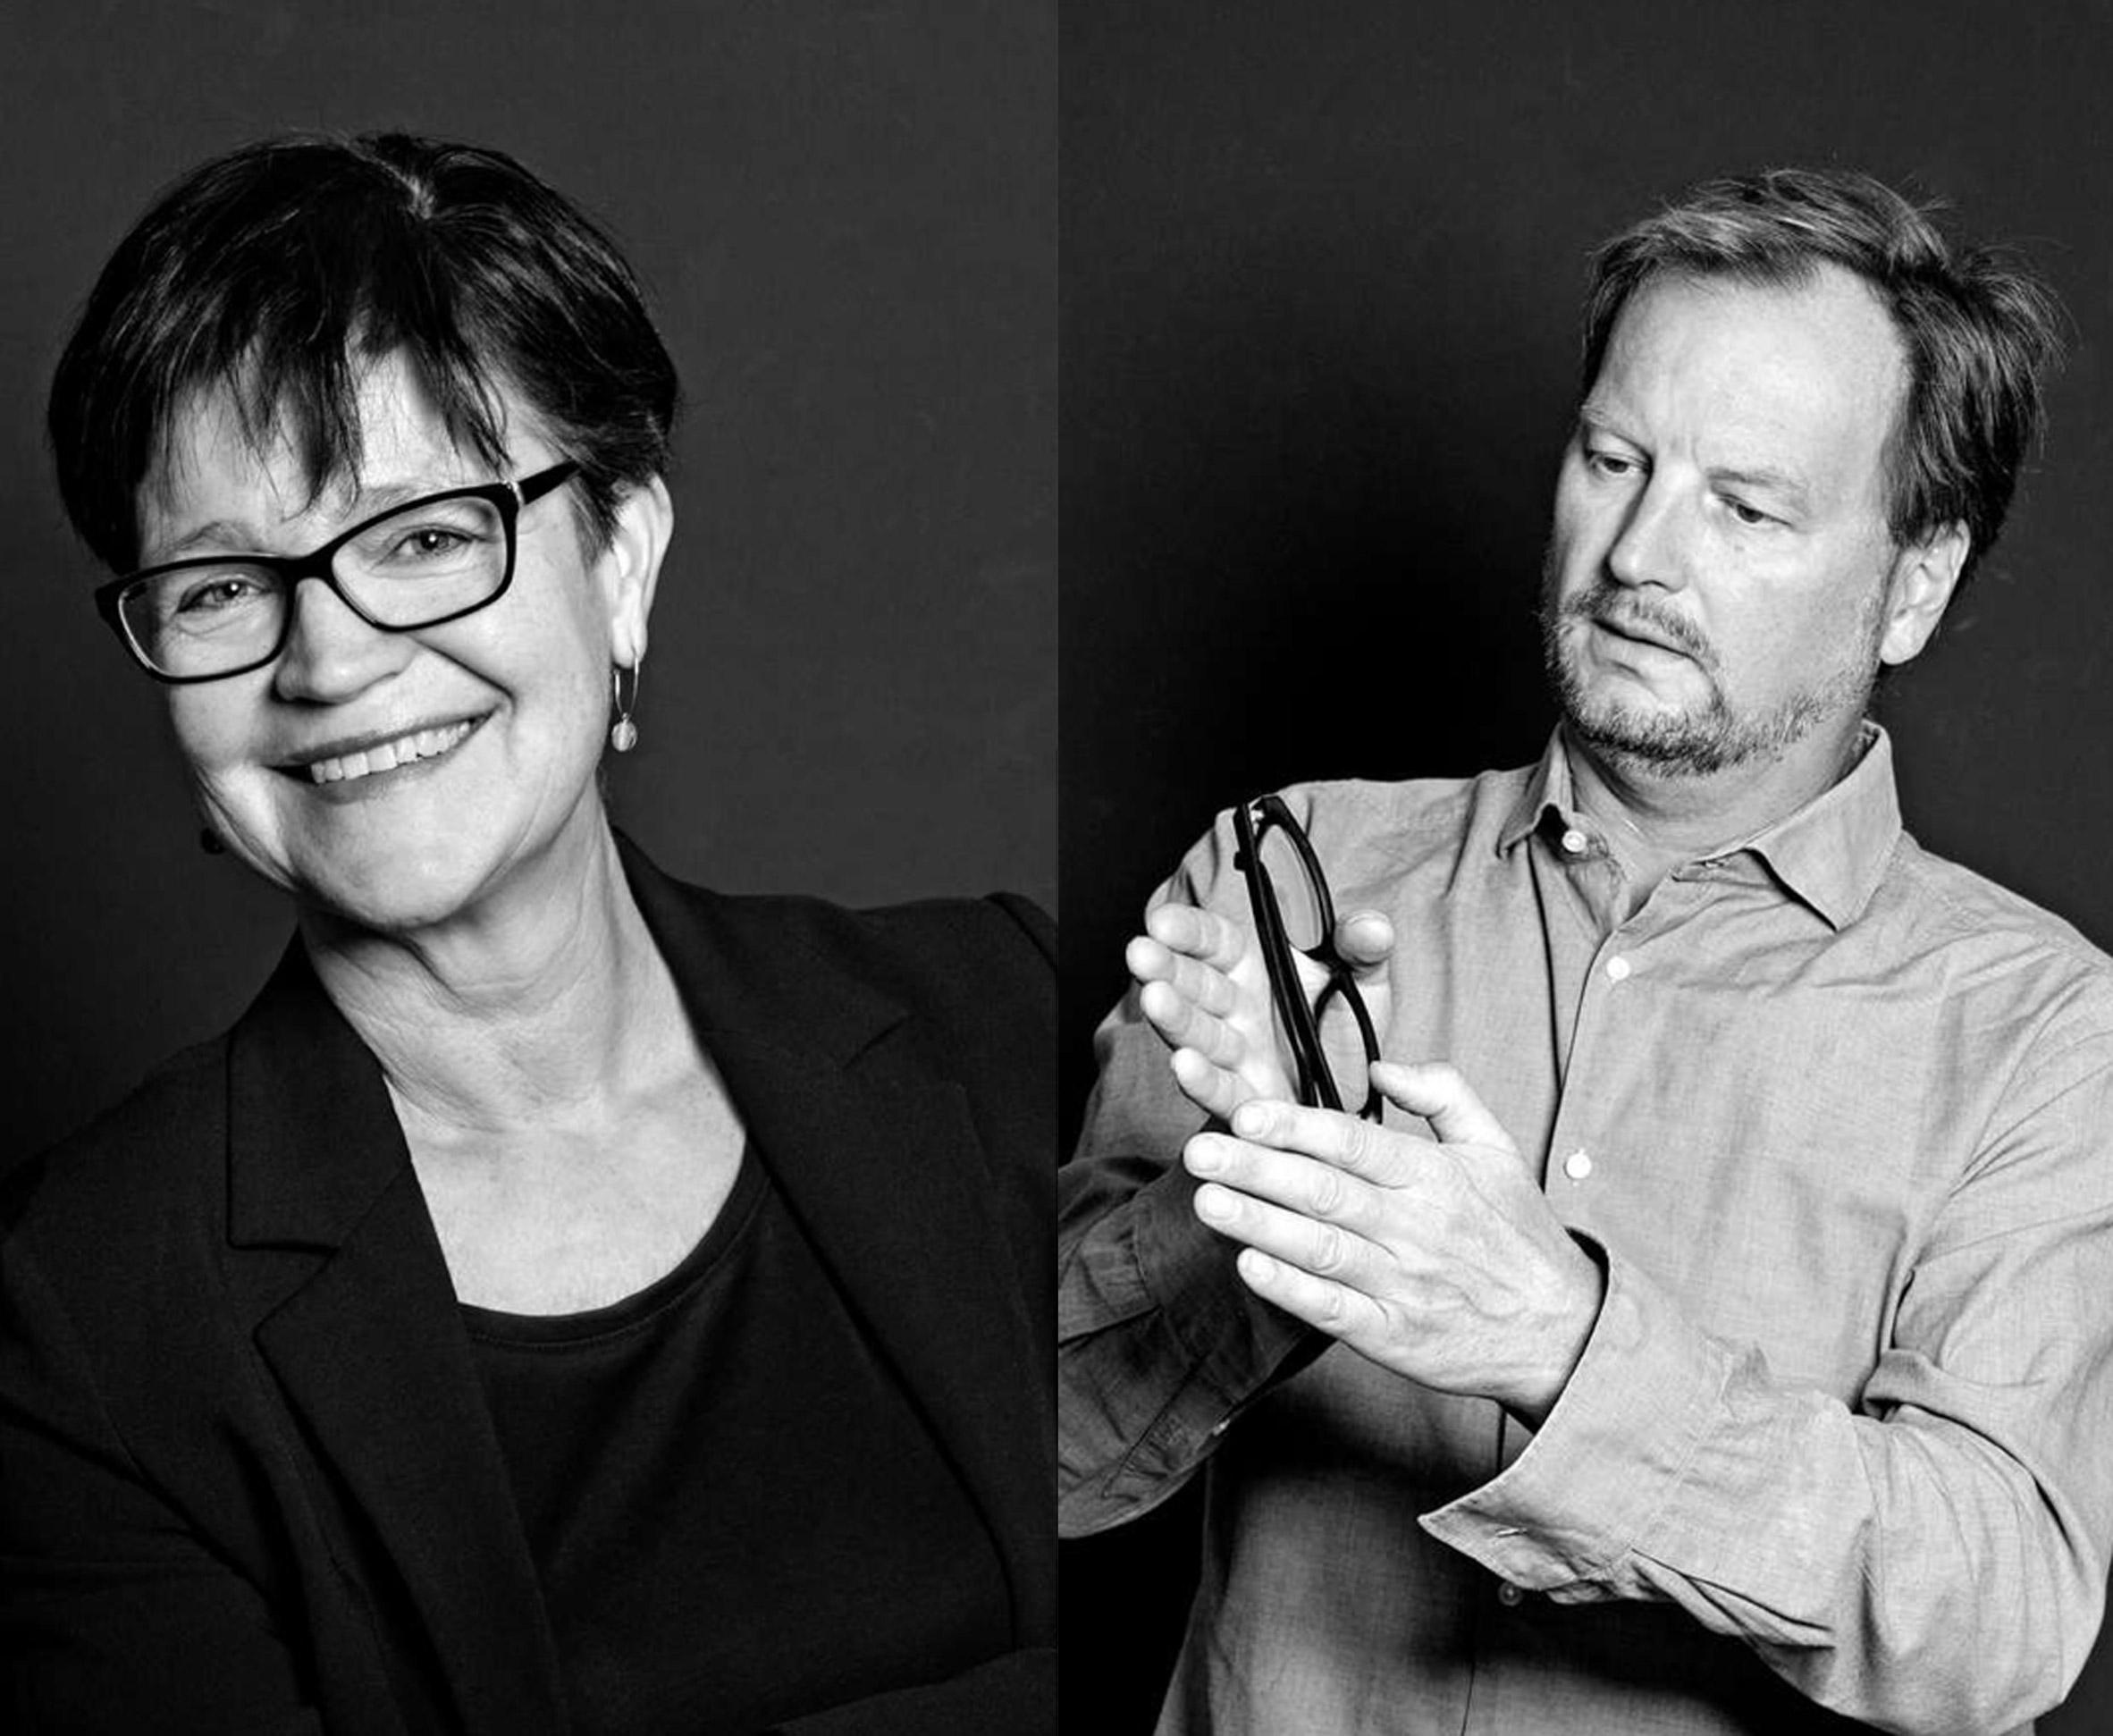 Mette Kynne Frandsen and Louis Becker portraits